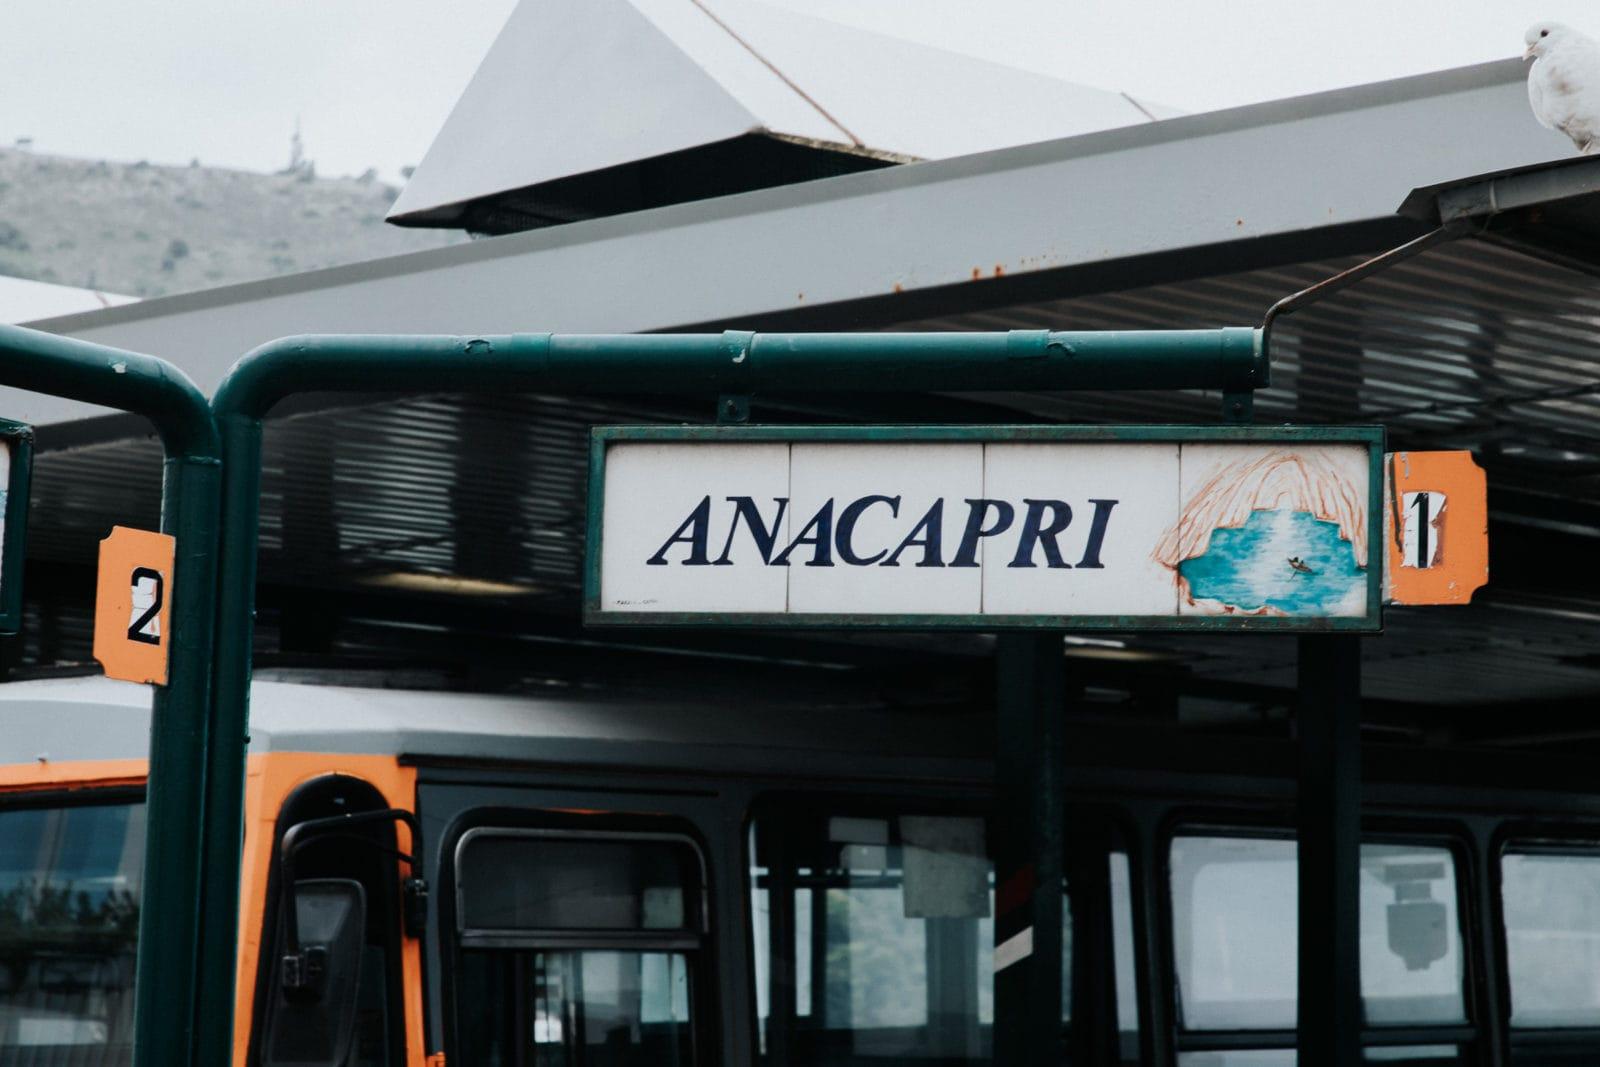 Capri Bus nach Anacapri Haltestelle